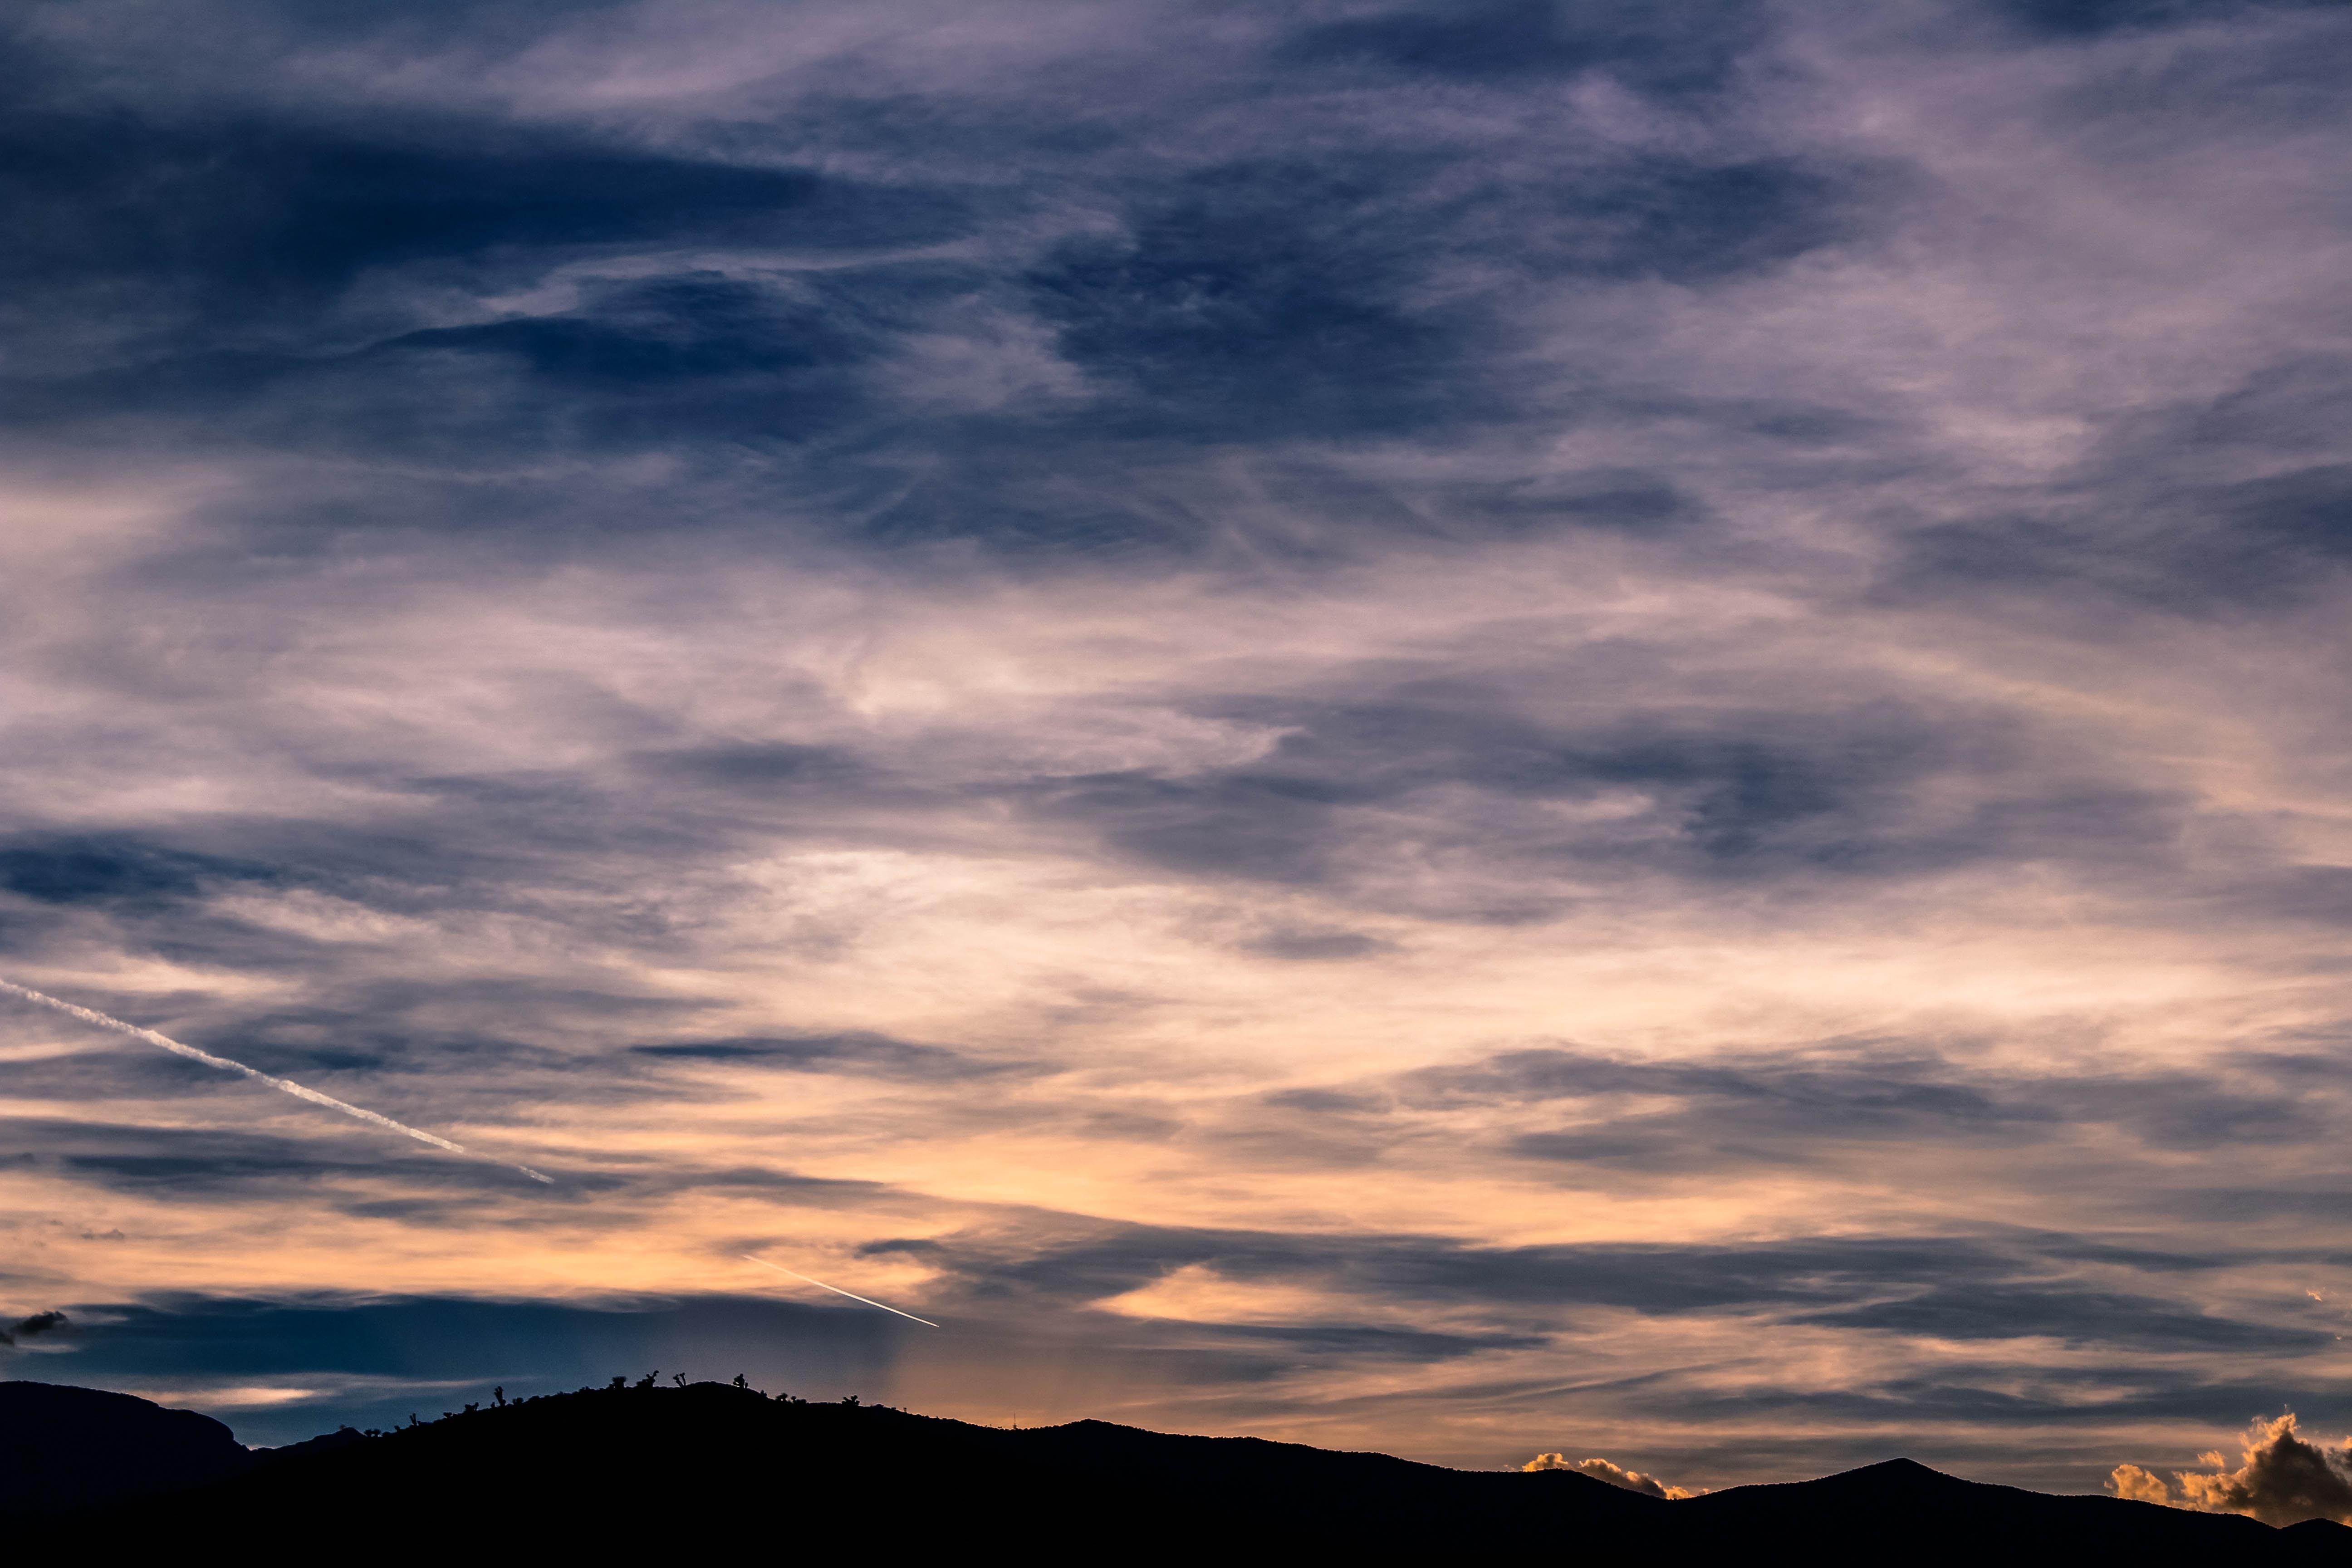 sky, the sky's the limit, the sky isn't the limit, sky, clouds, beautiful, art, creator, creation, creativity